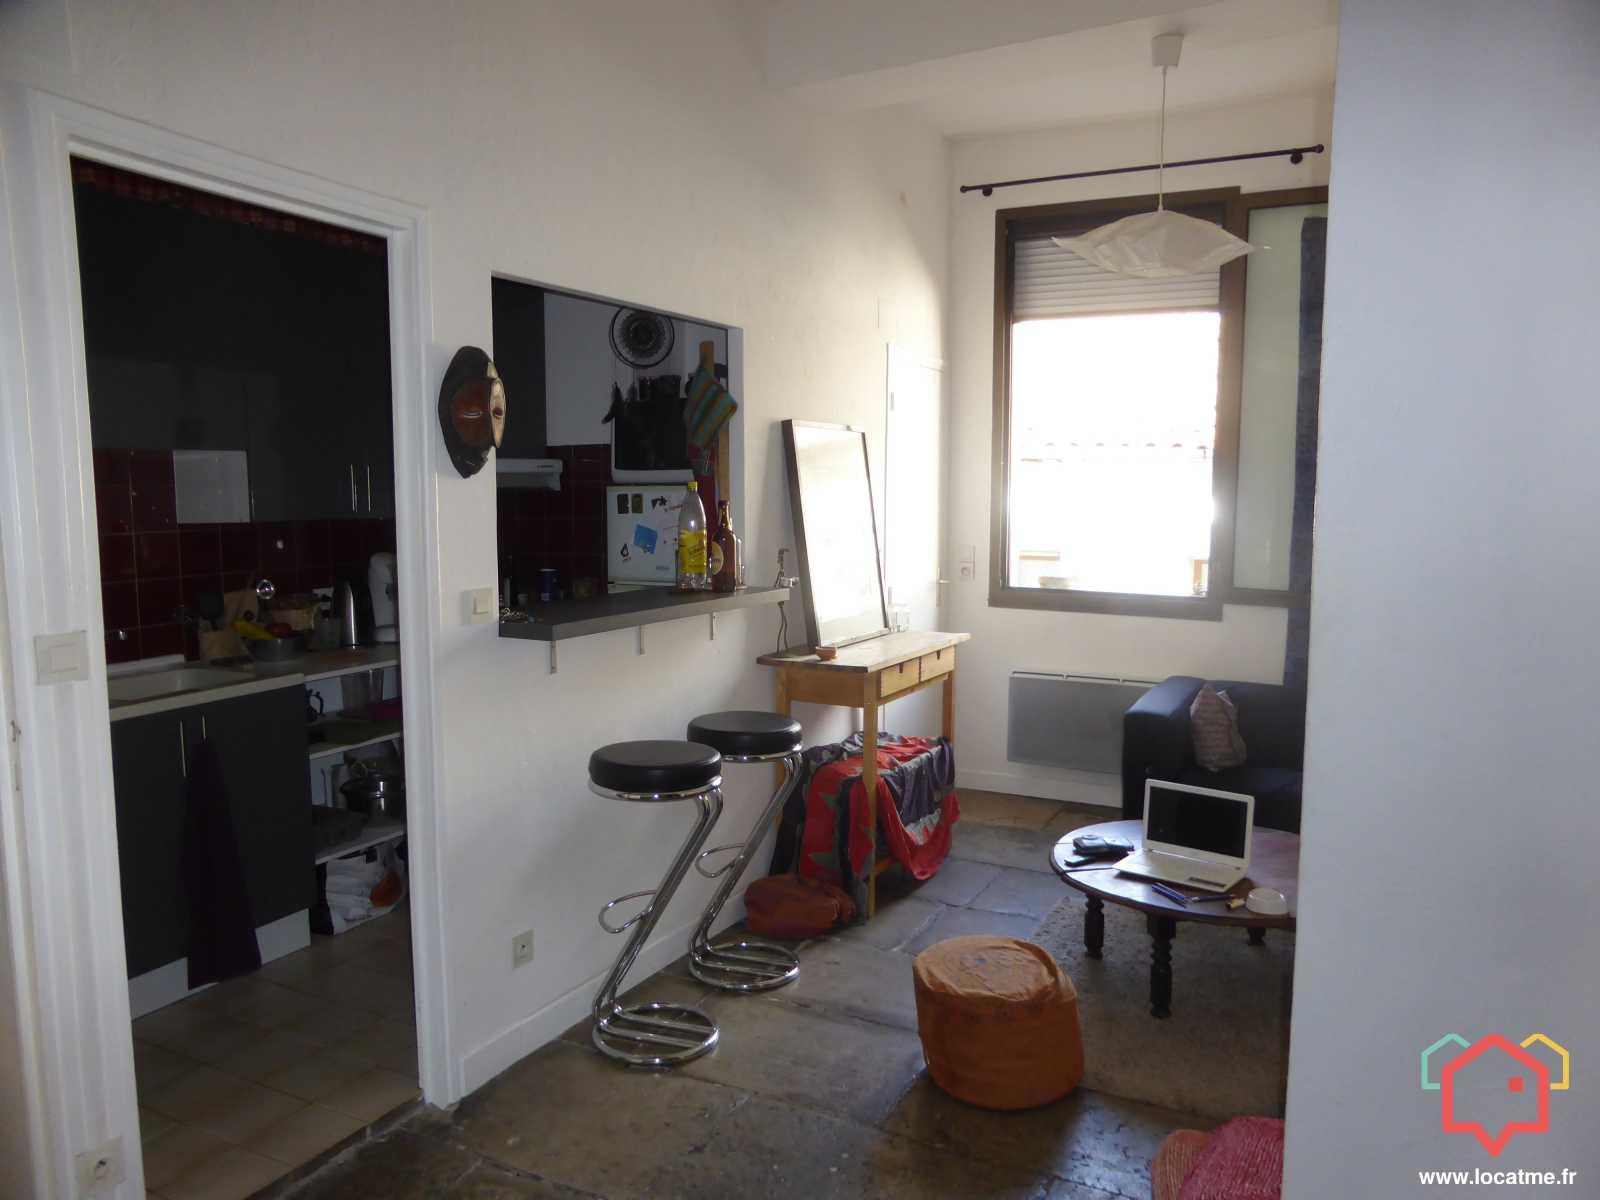 Location appartement non meubl 43m2 montpellier - Louer appartement meuble montpellier ...